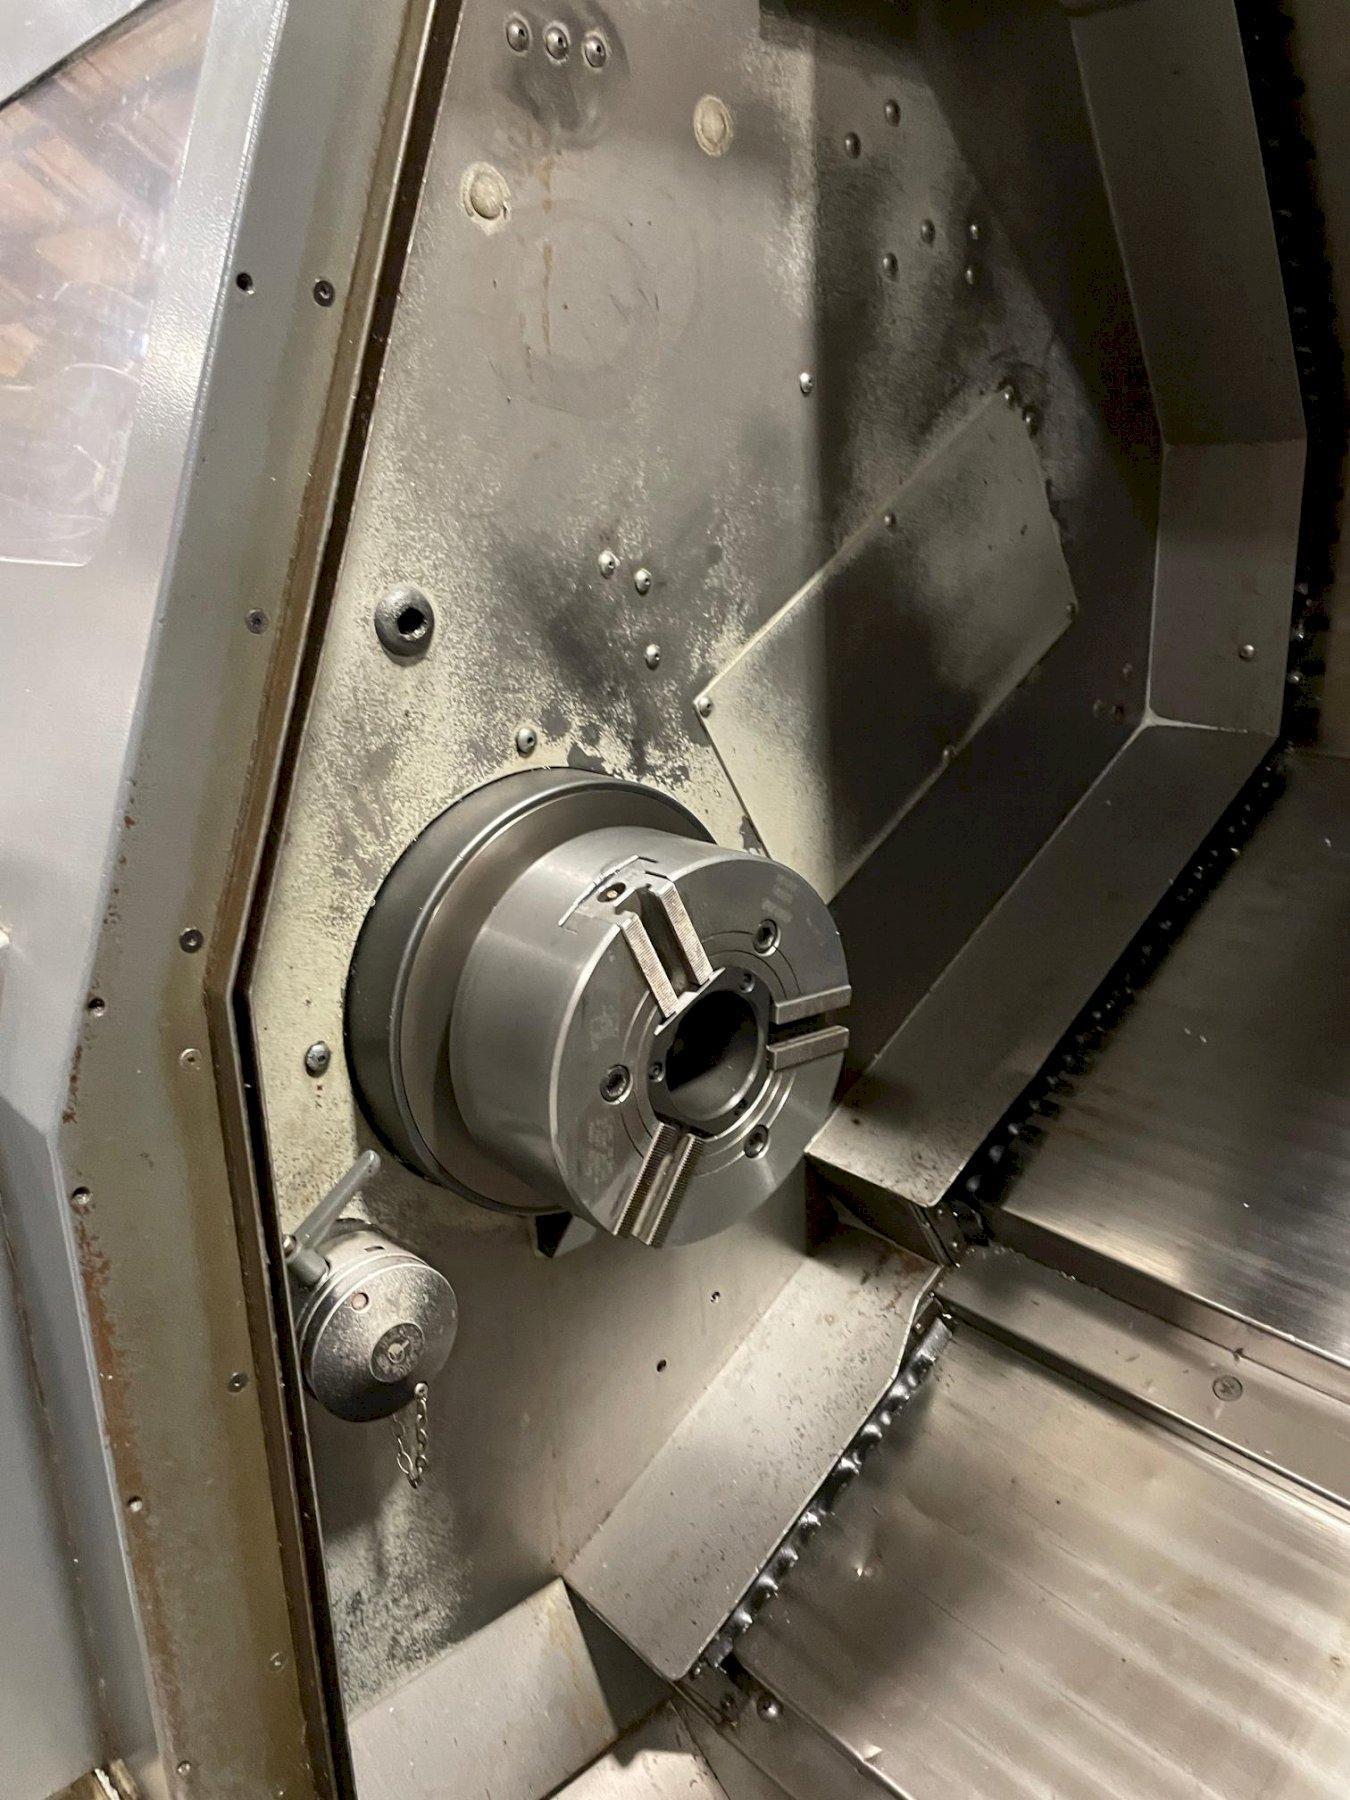 Mori Seiki SL-204SMC Horizontal CNC Lathe